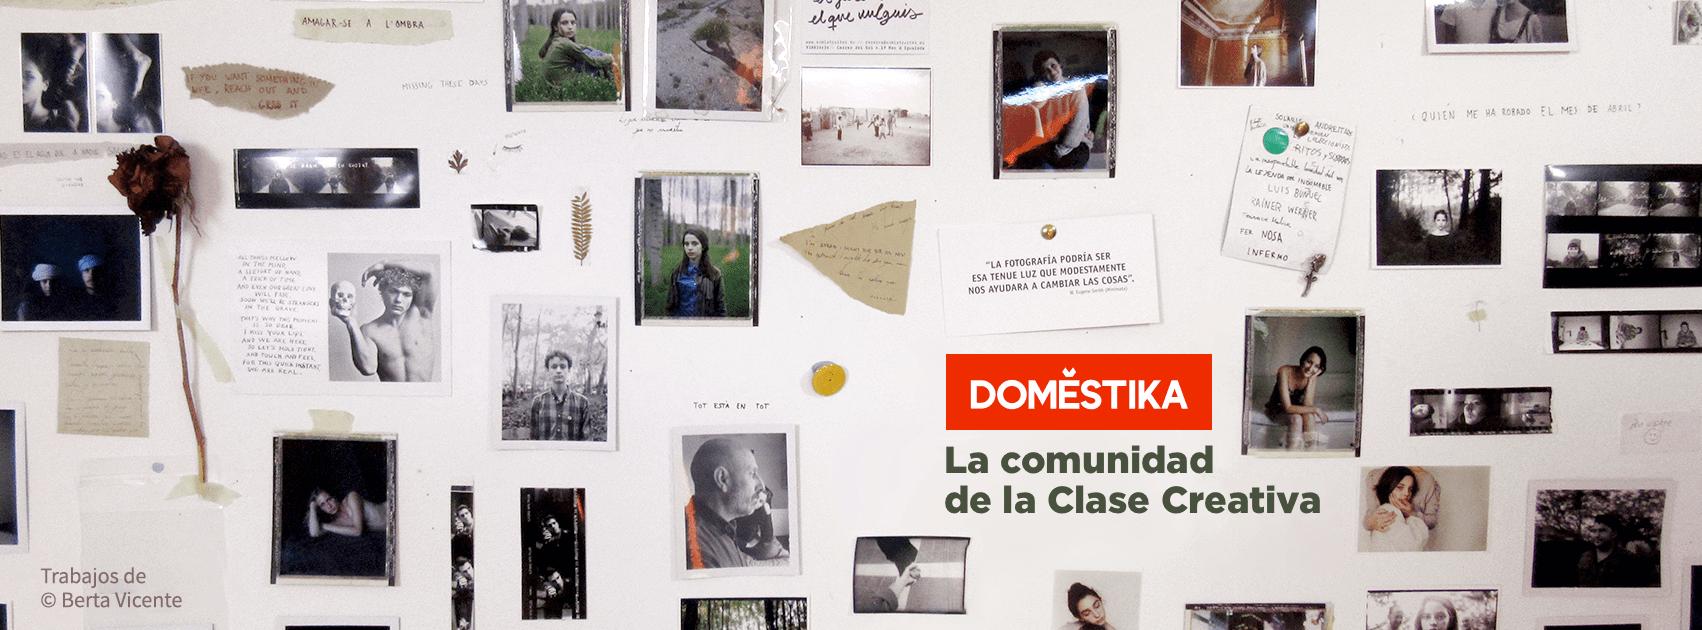 Banner de códigos de descuento de cursos domestika